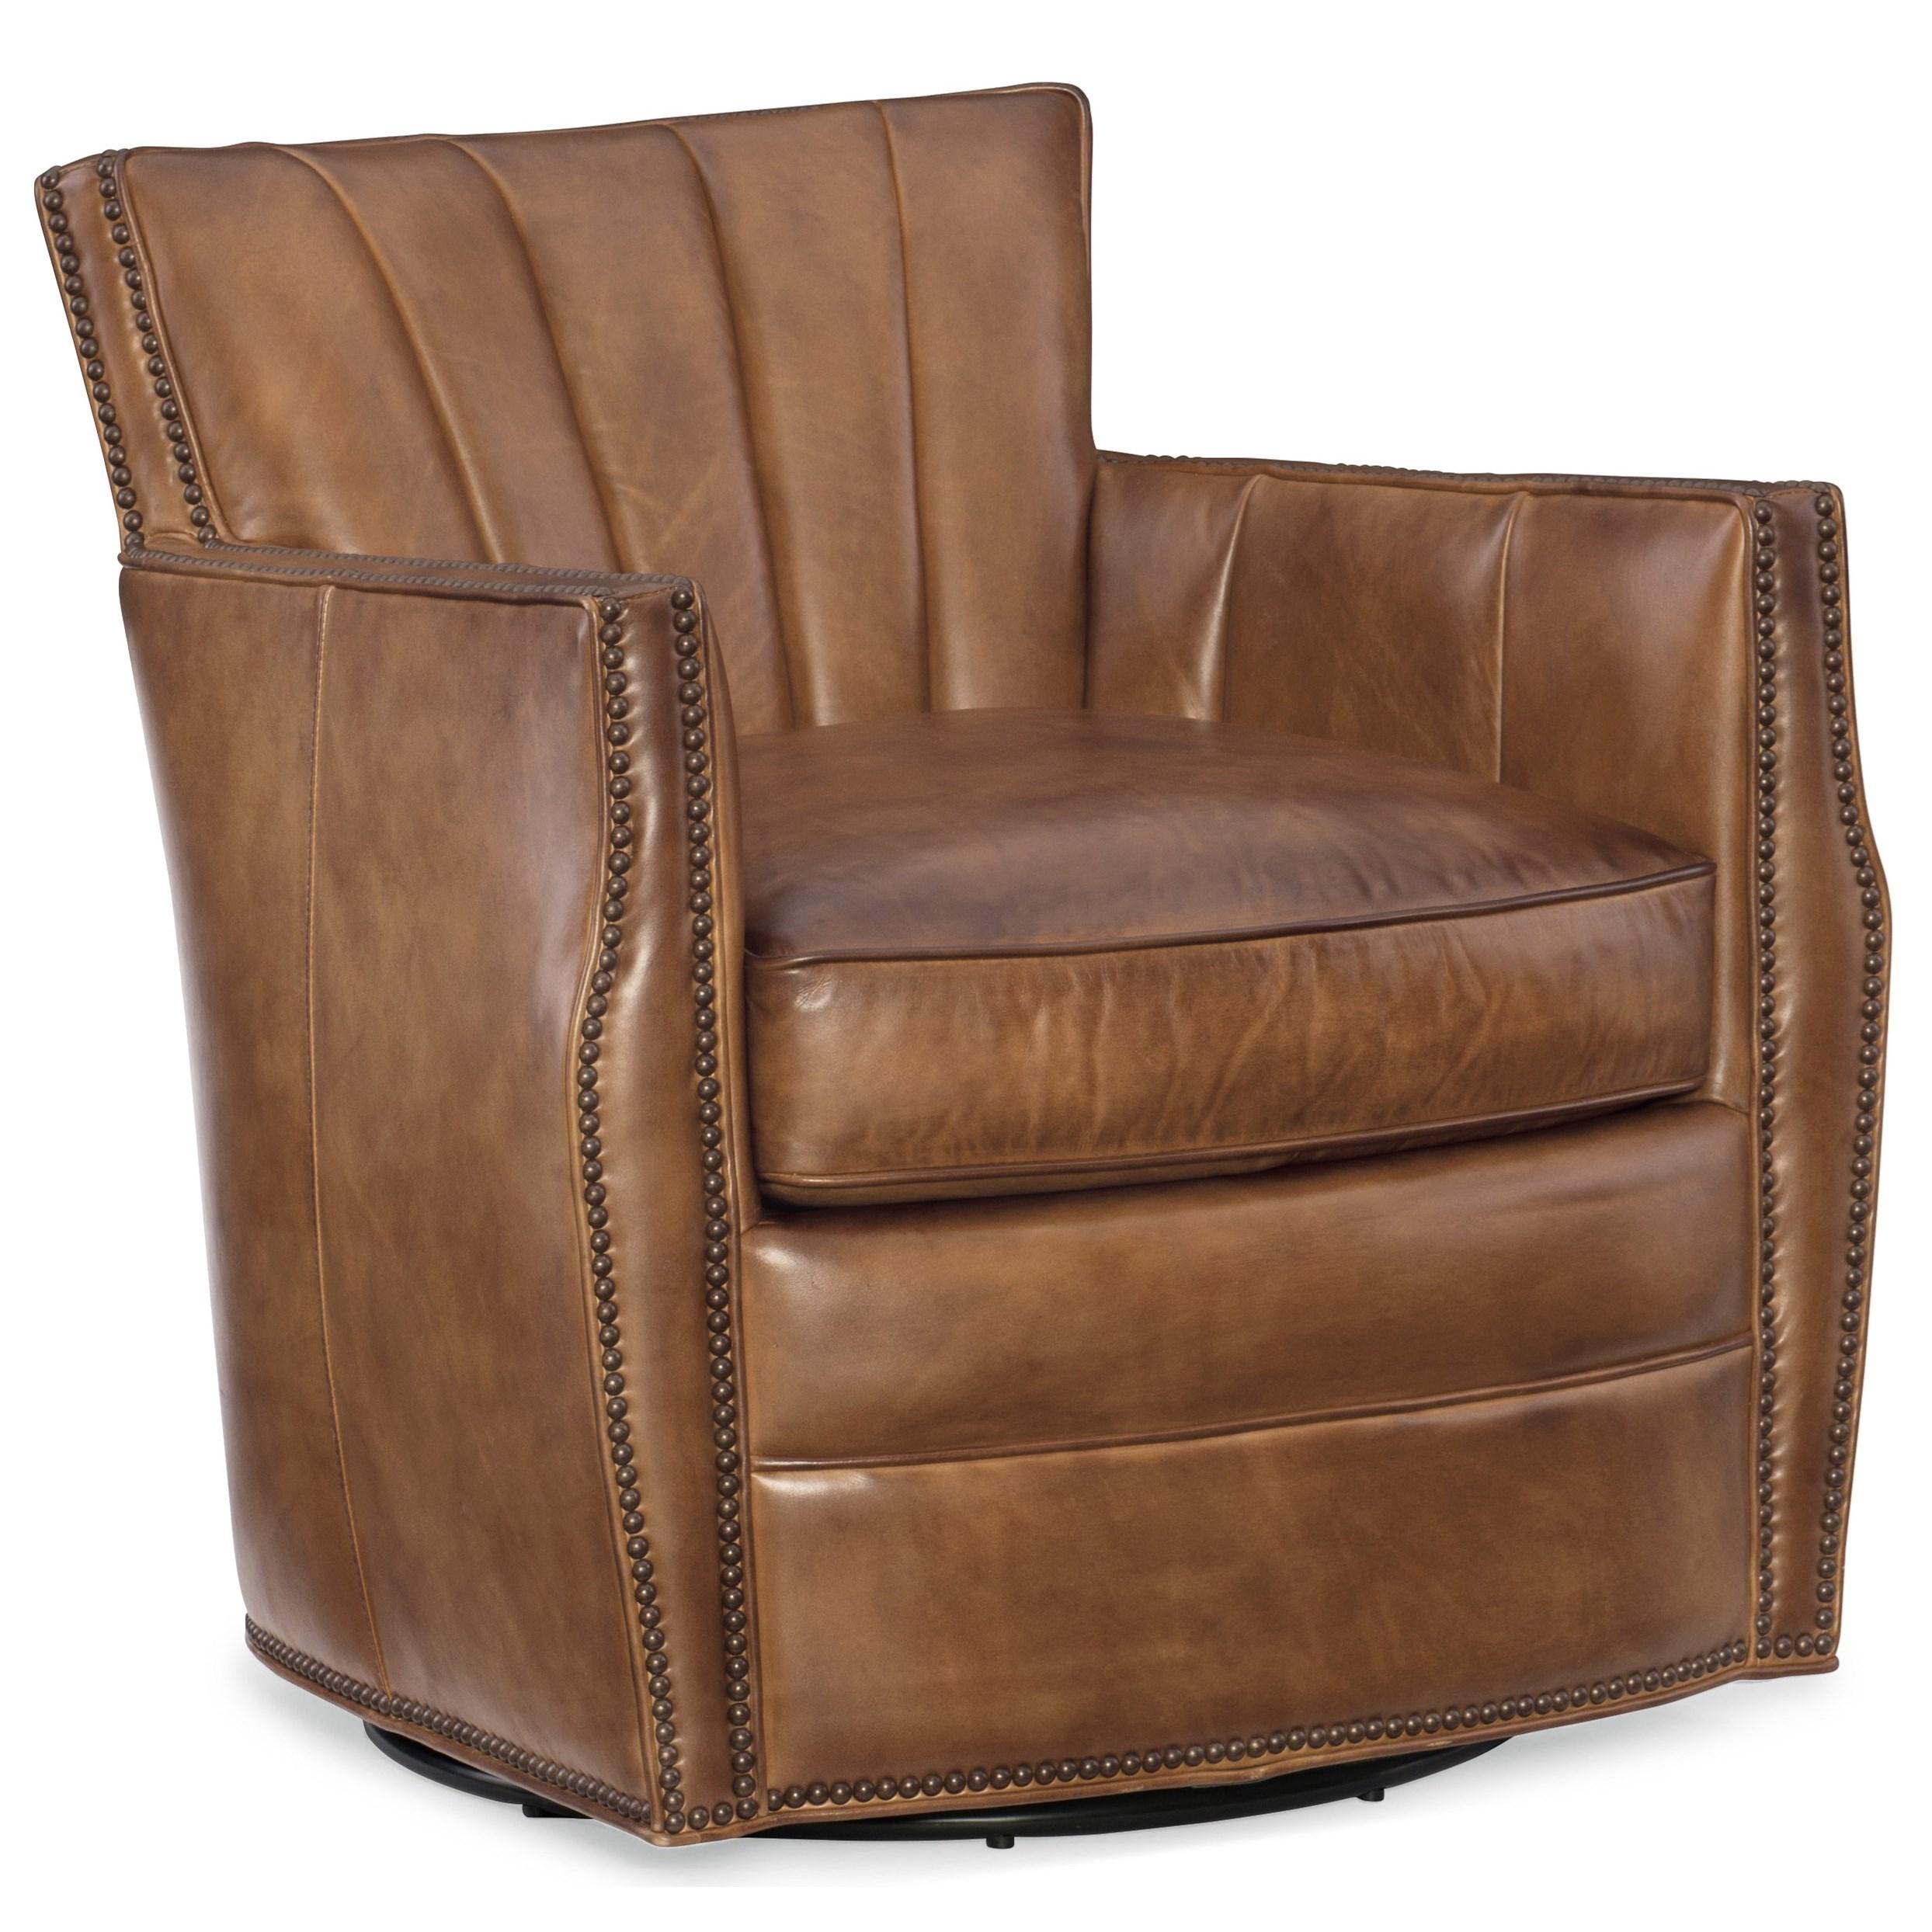 Hooker furniture club chairs carson swivel club chair for Carson chaise lounge